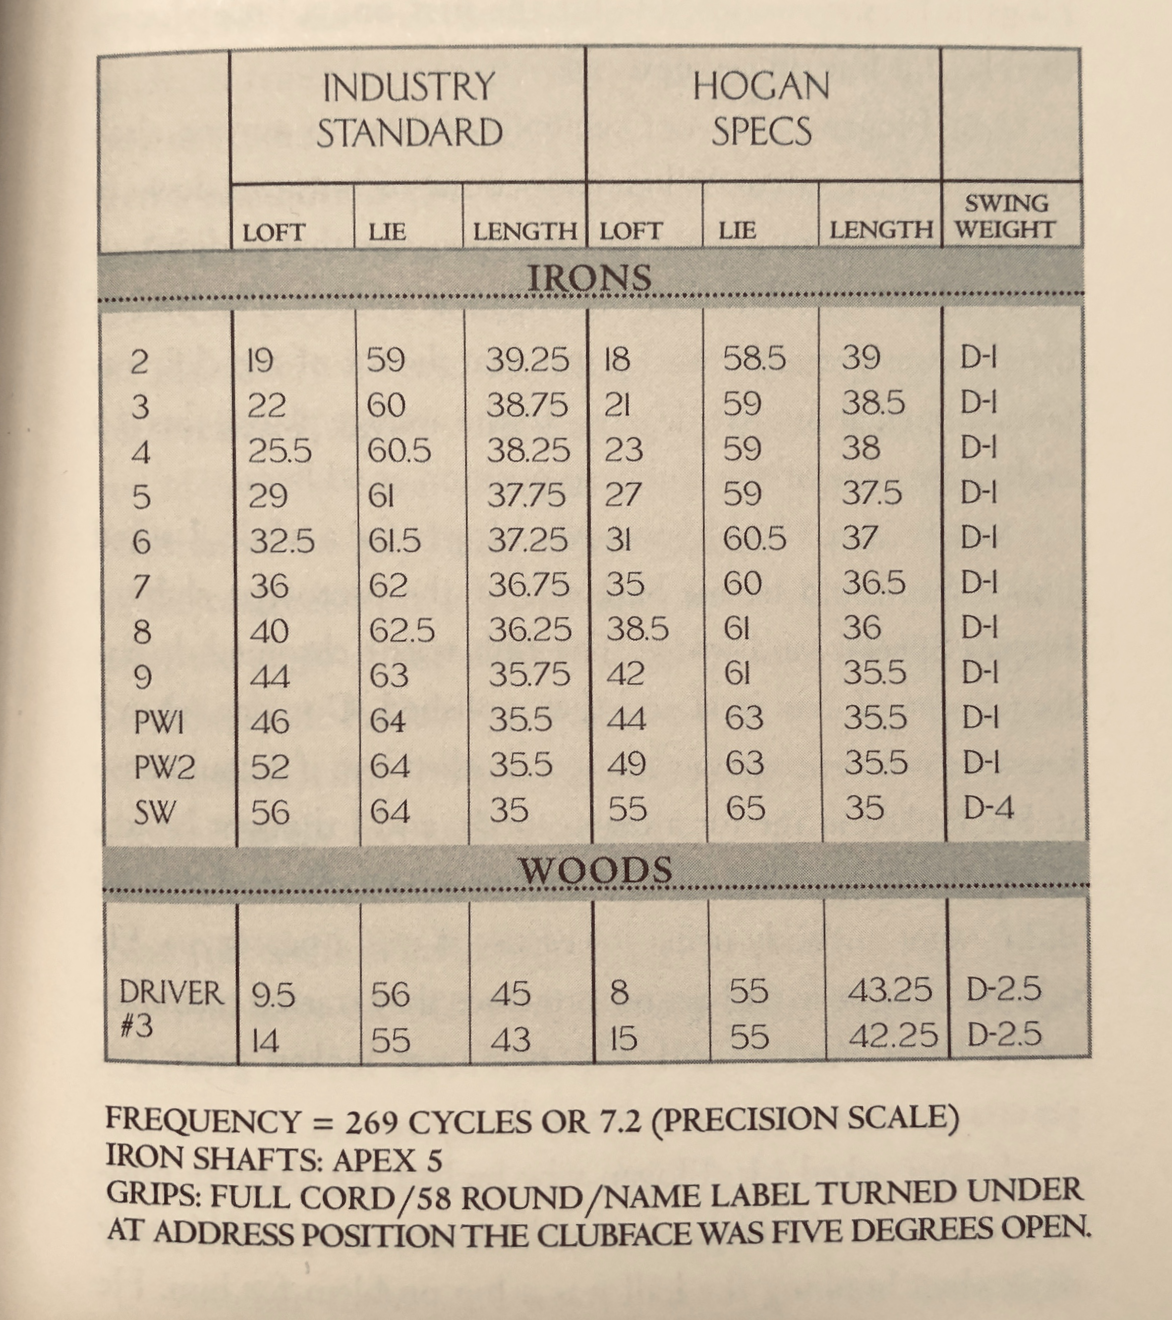 Ben Hogan's club specifications